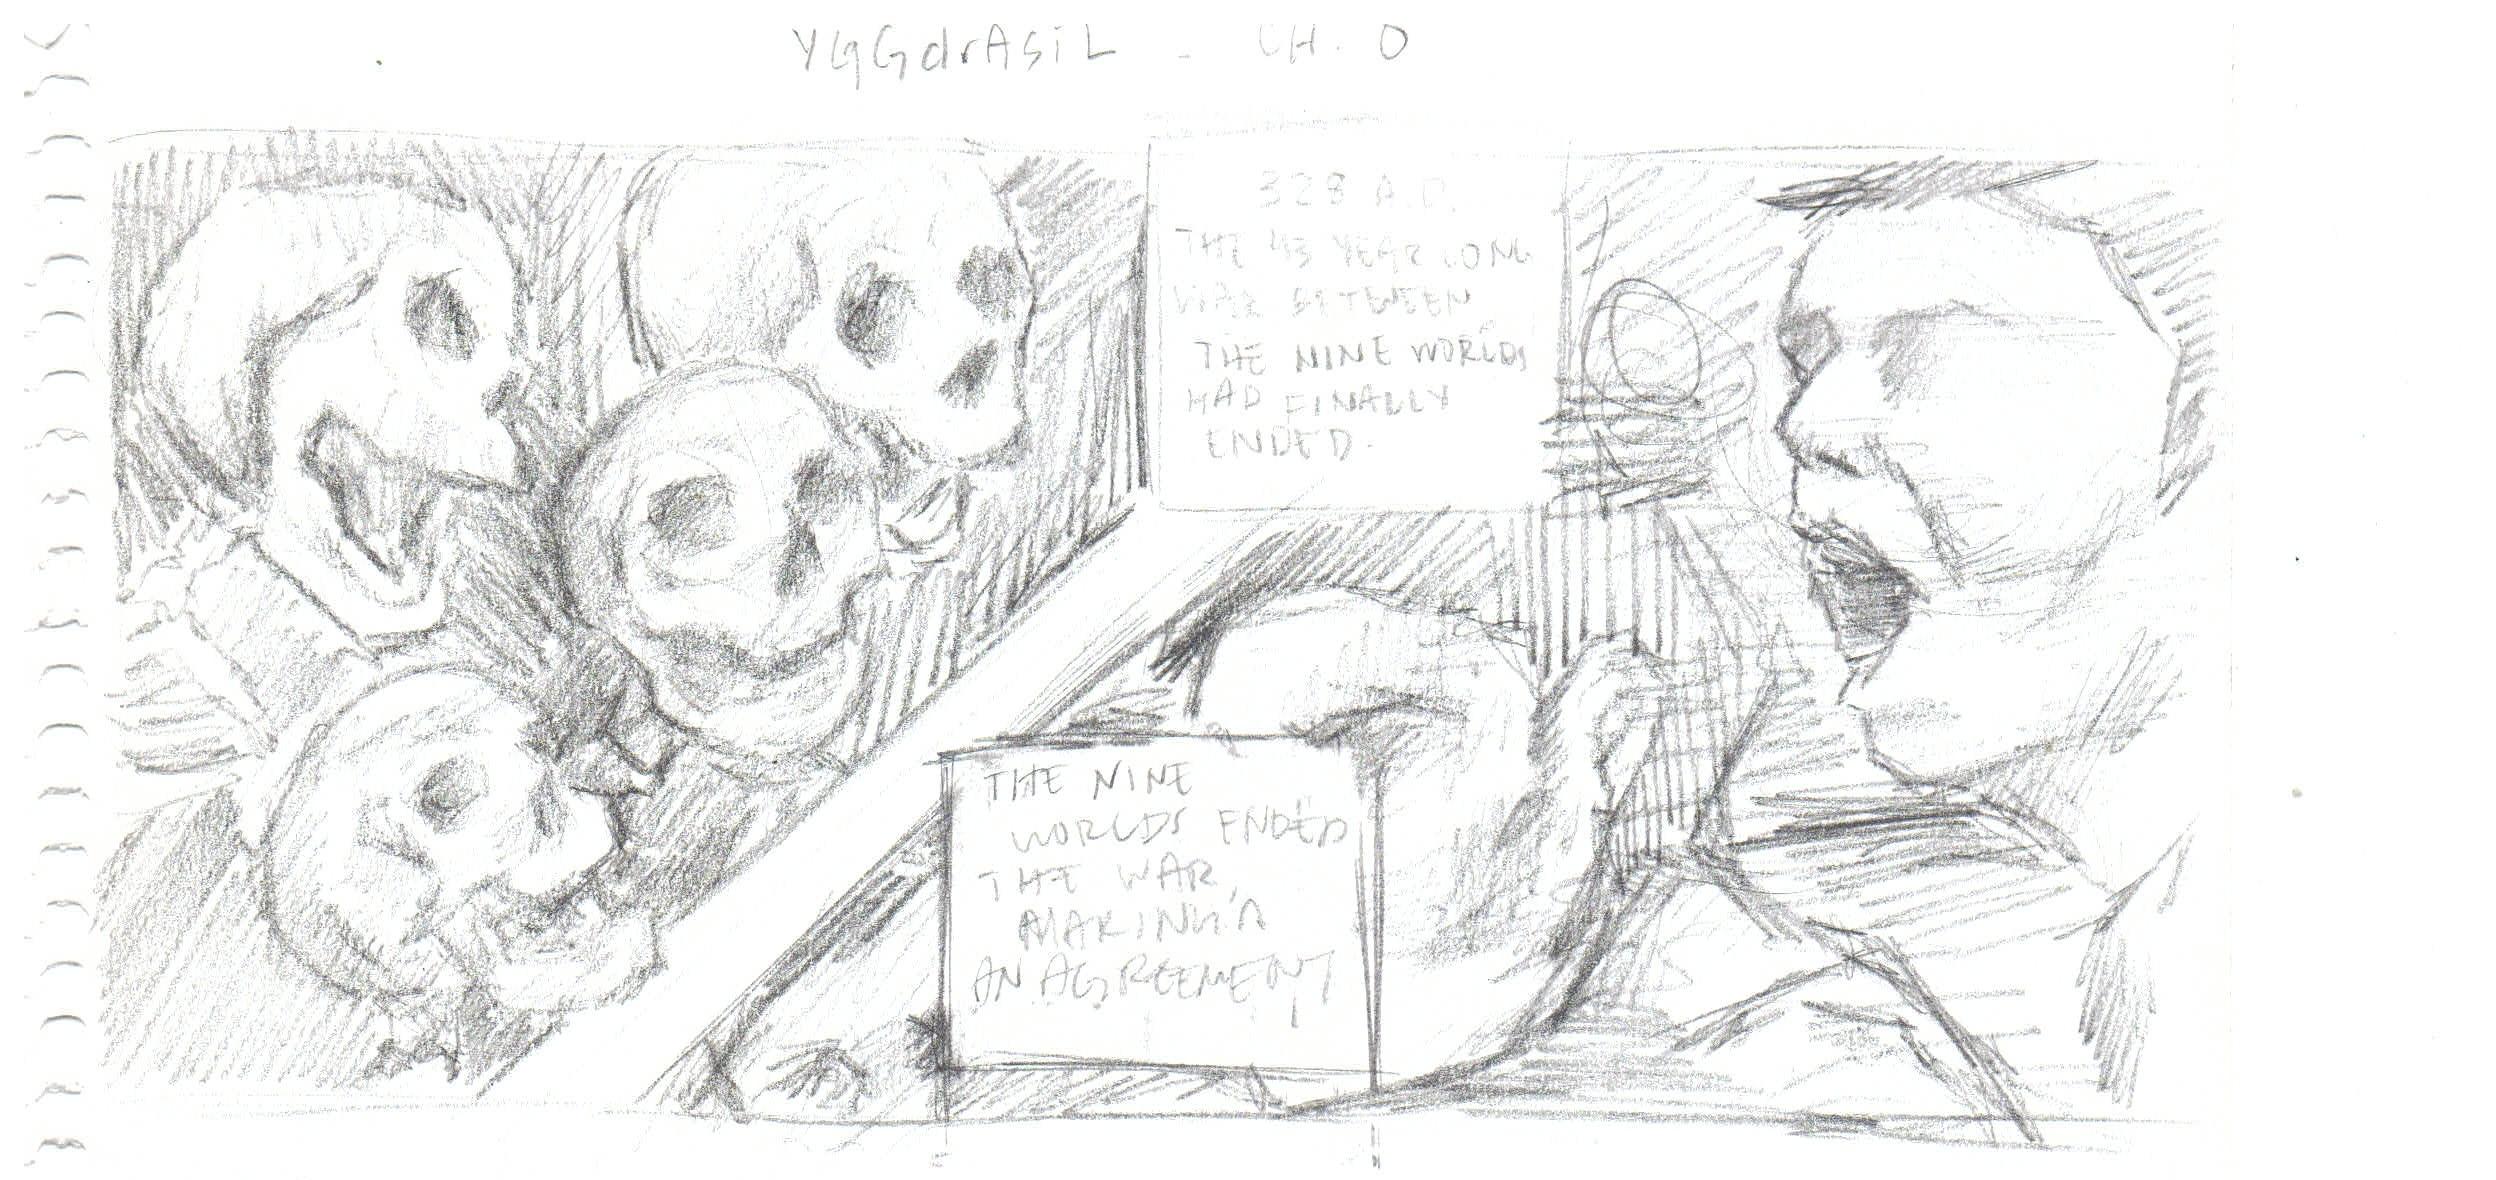 Yggdrasil Draft , 2017. Pencil on Paper